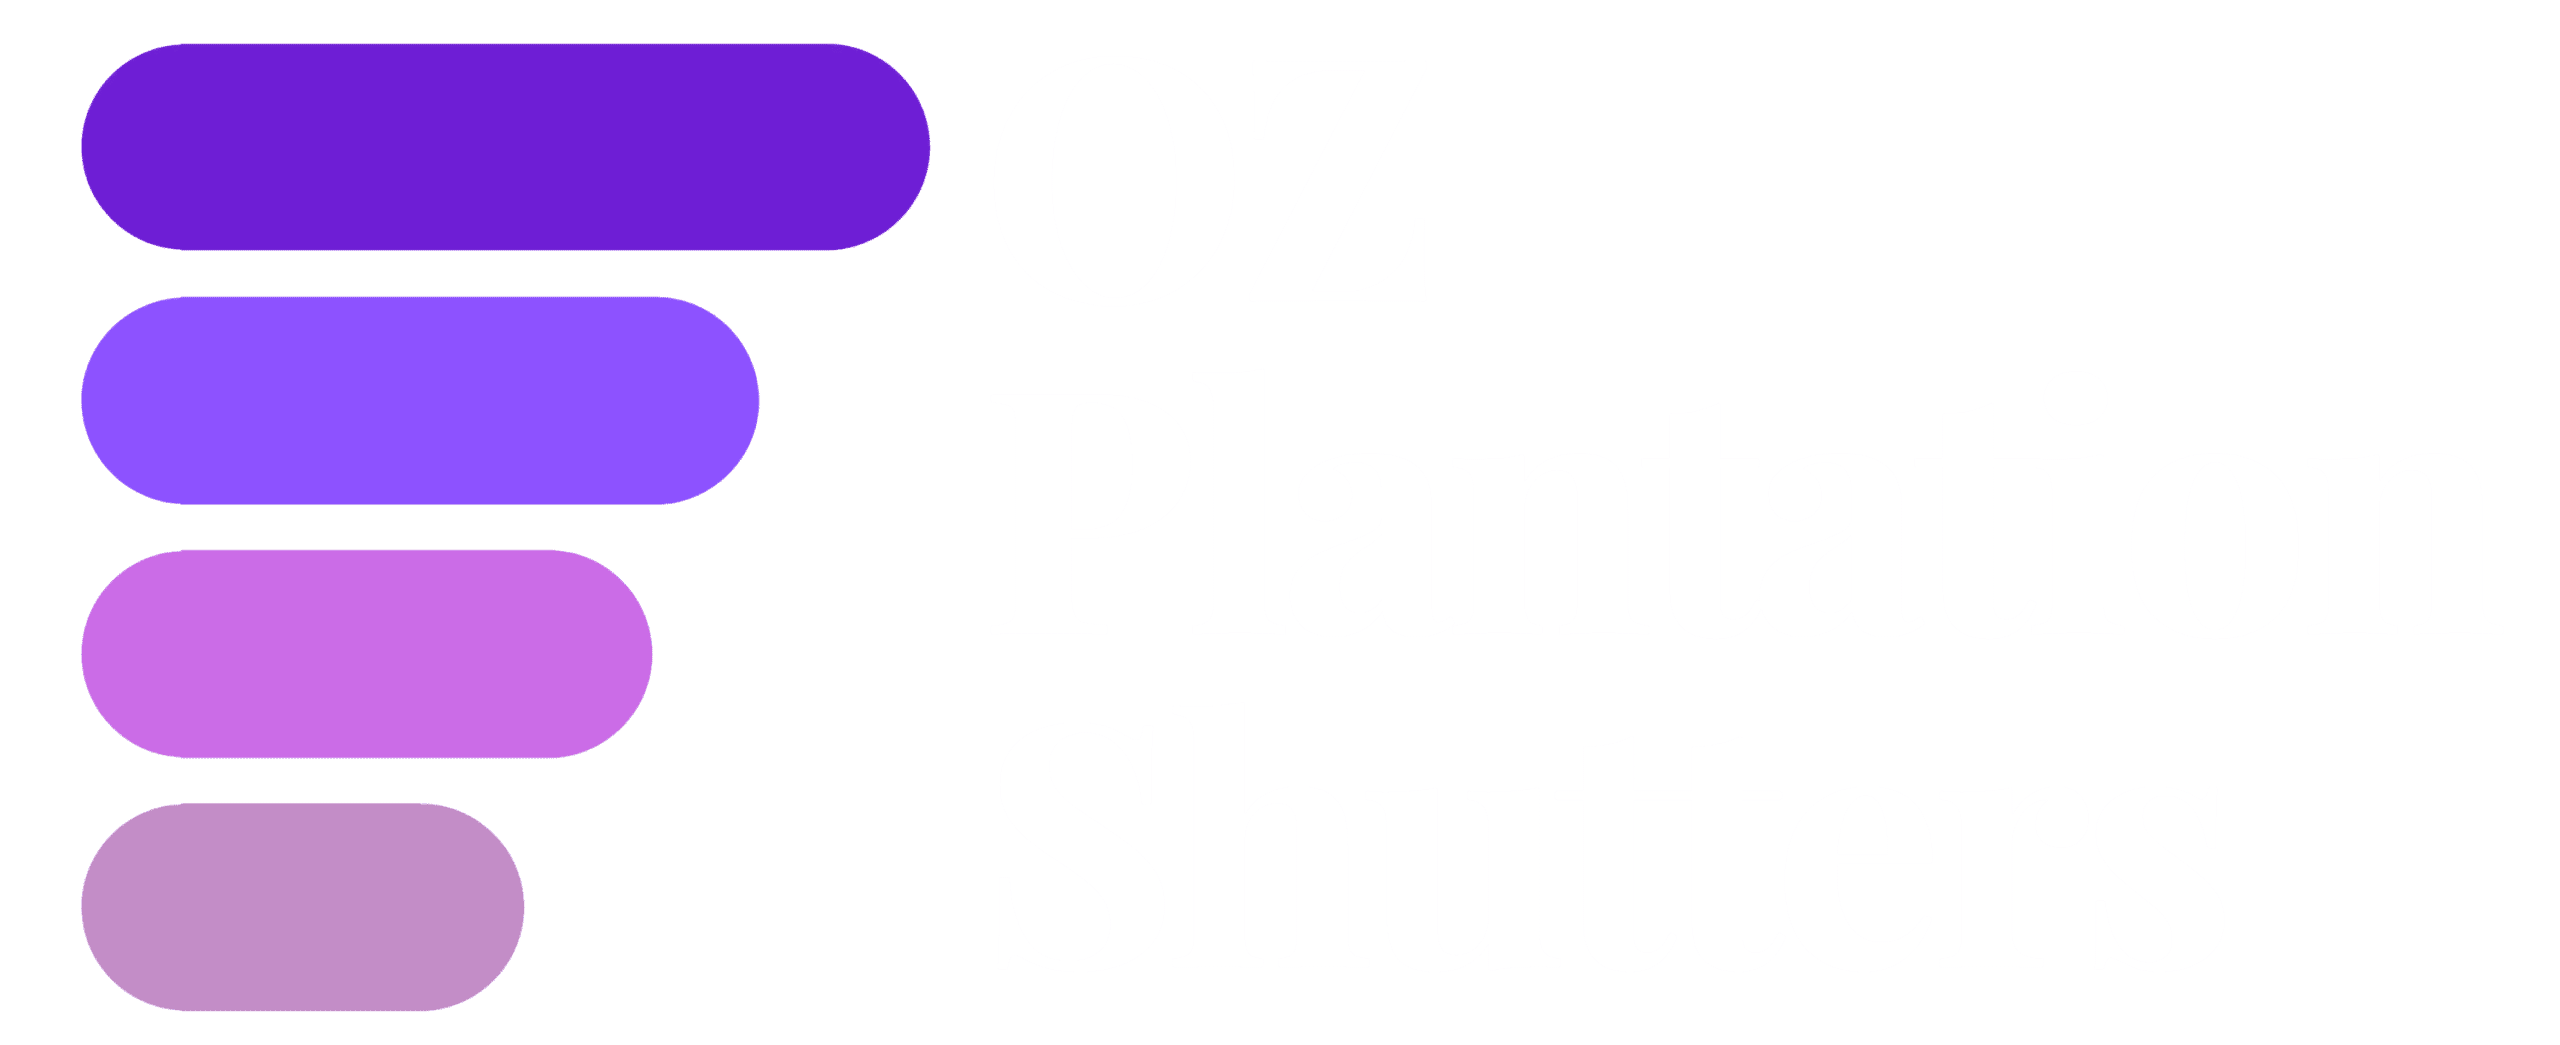 OZ Plantation Shutters